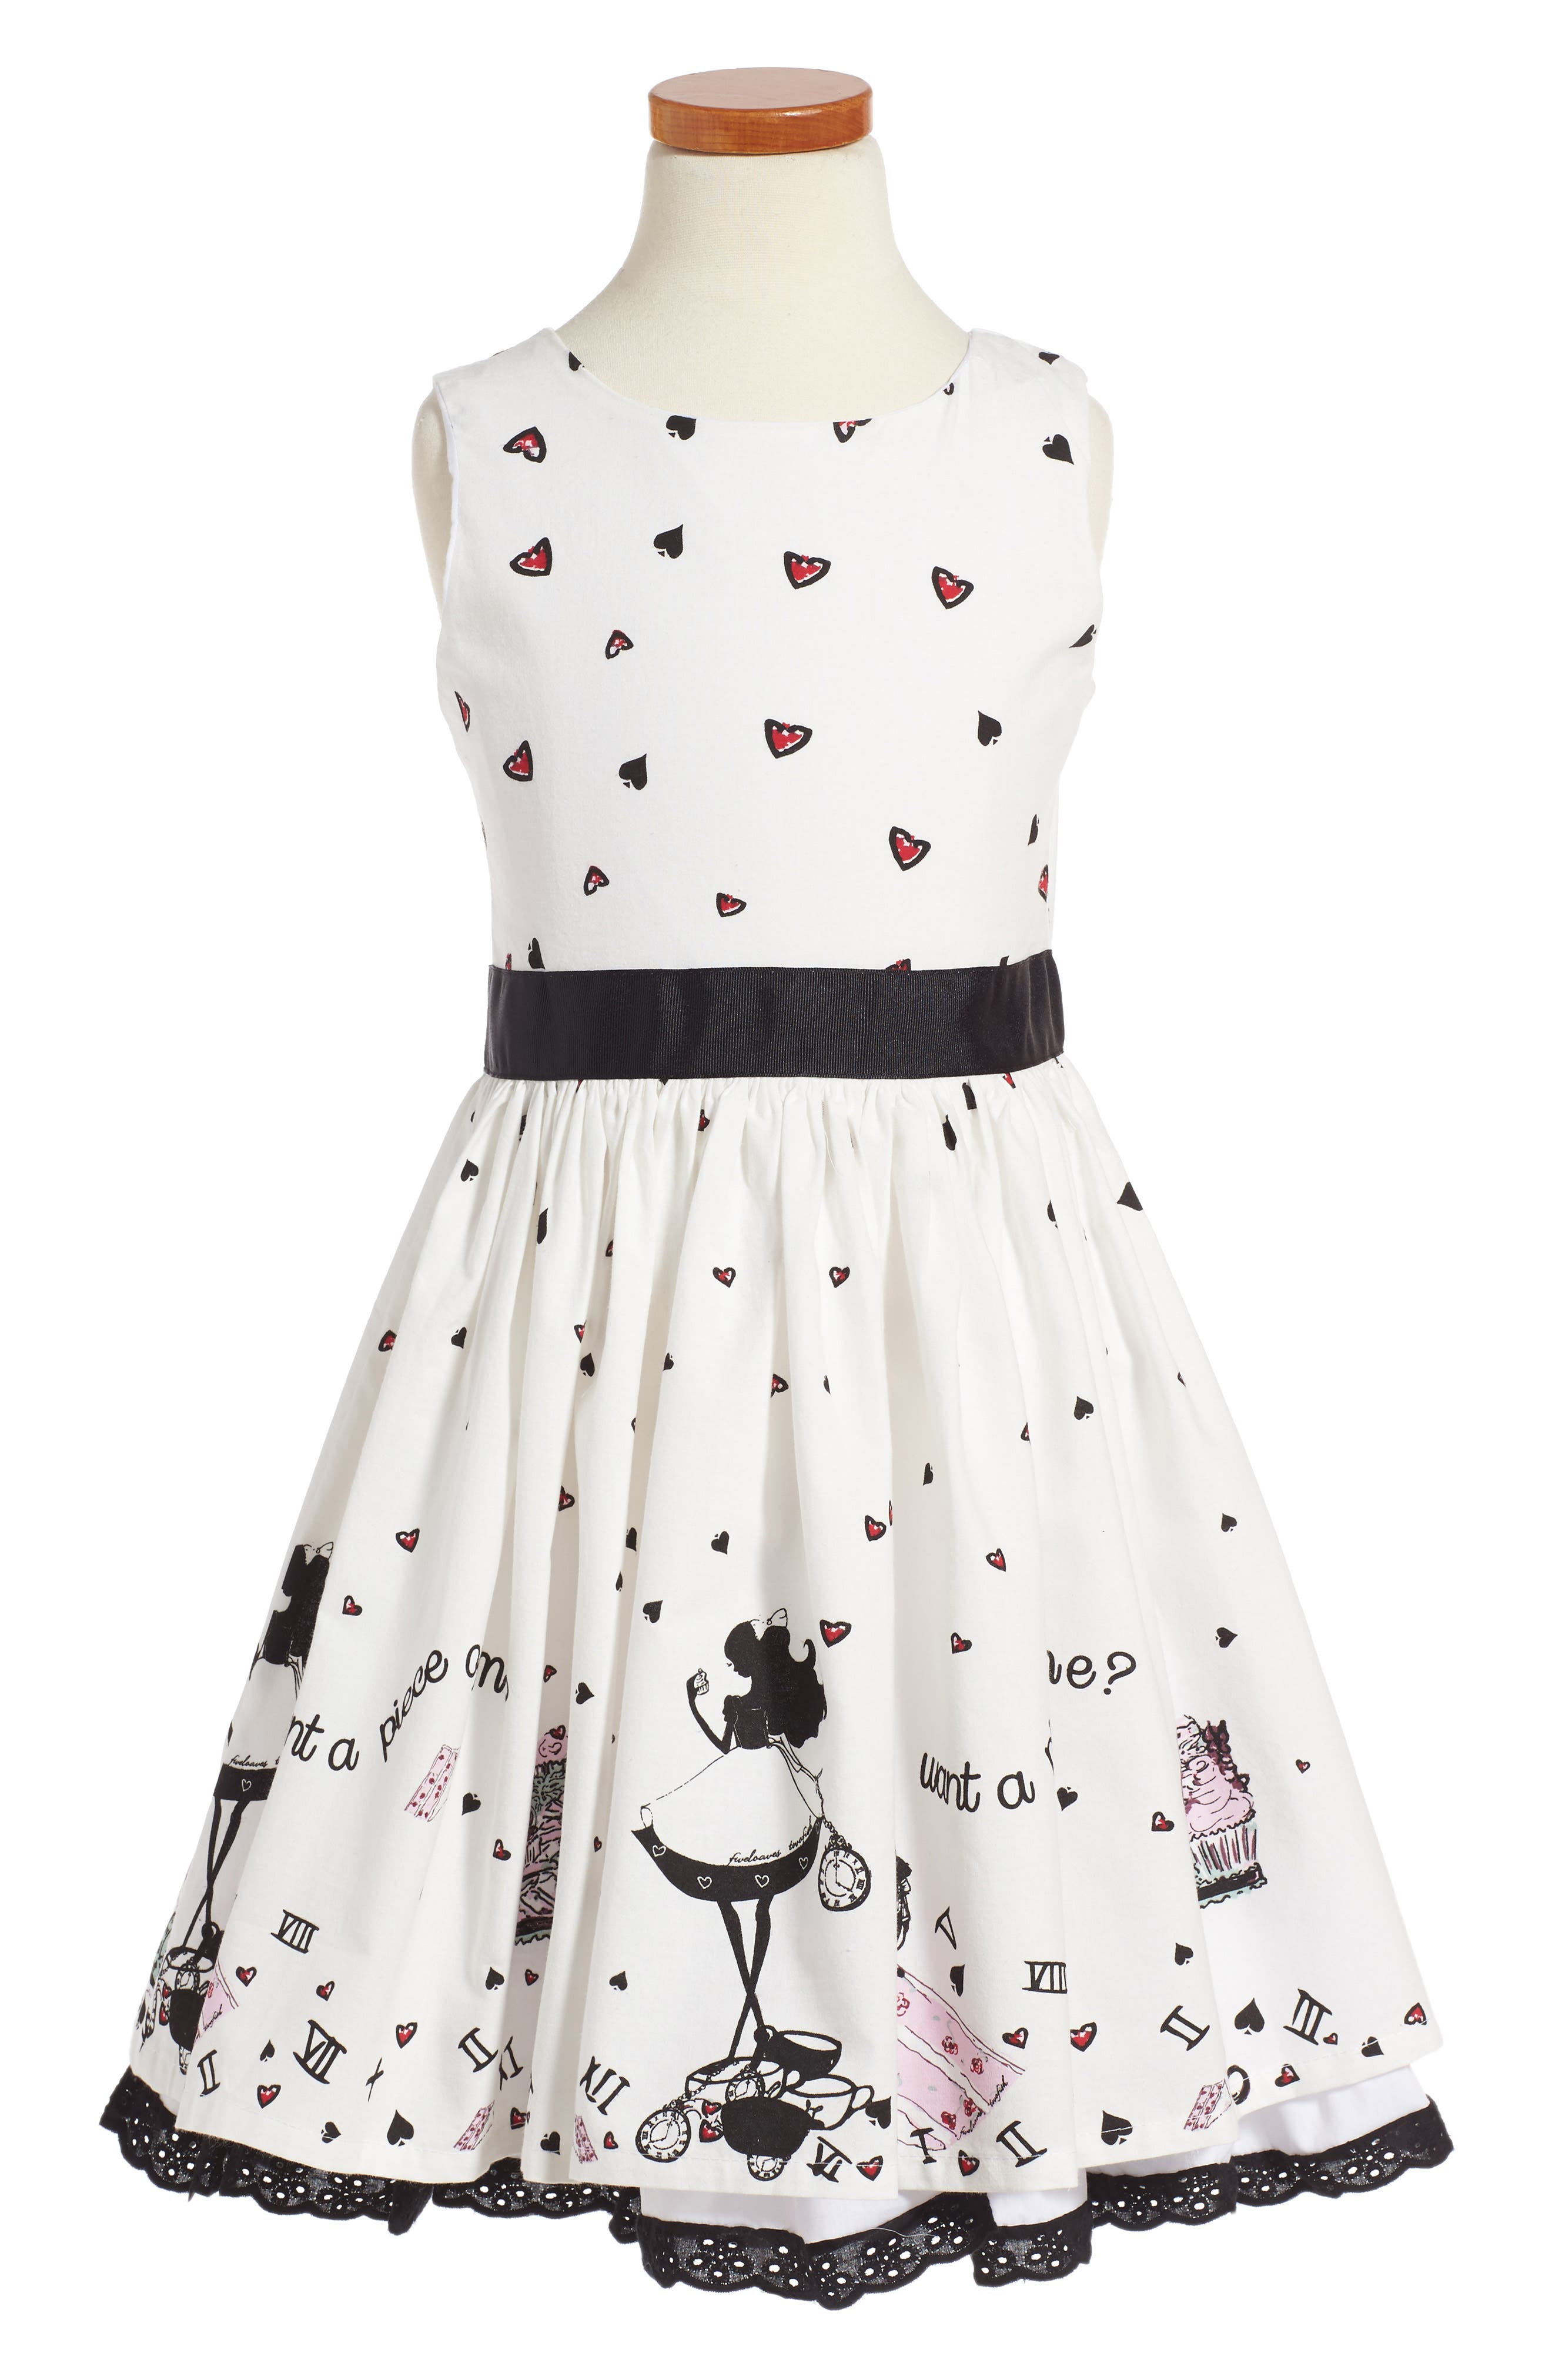 Alternate Image 1 Selected - Fiveloaves Twofish Alice Party Dress (Toddler Girls, Little Girls & Big Girls)